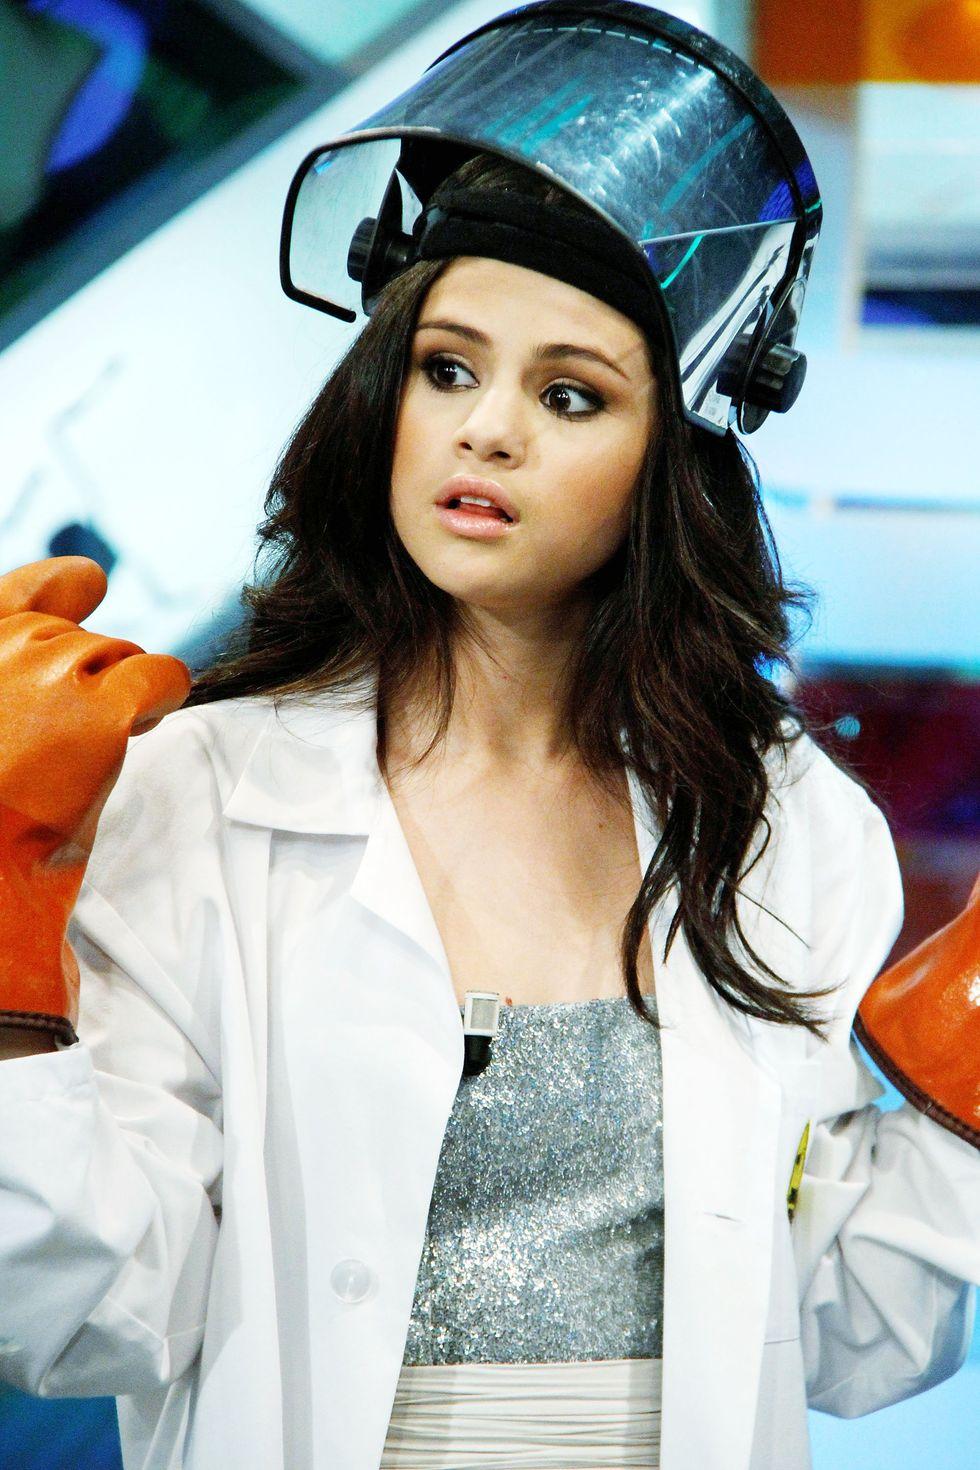 Selena Gomez 2010 : selena-gomez-el-hormiguero-tv-show-stills-hq-03